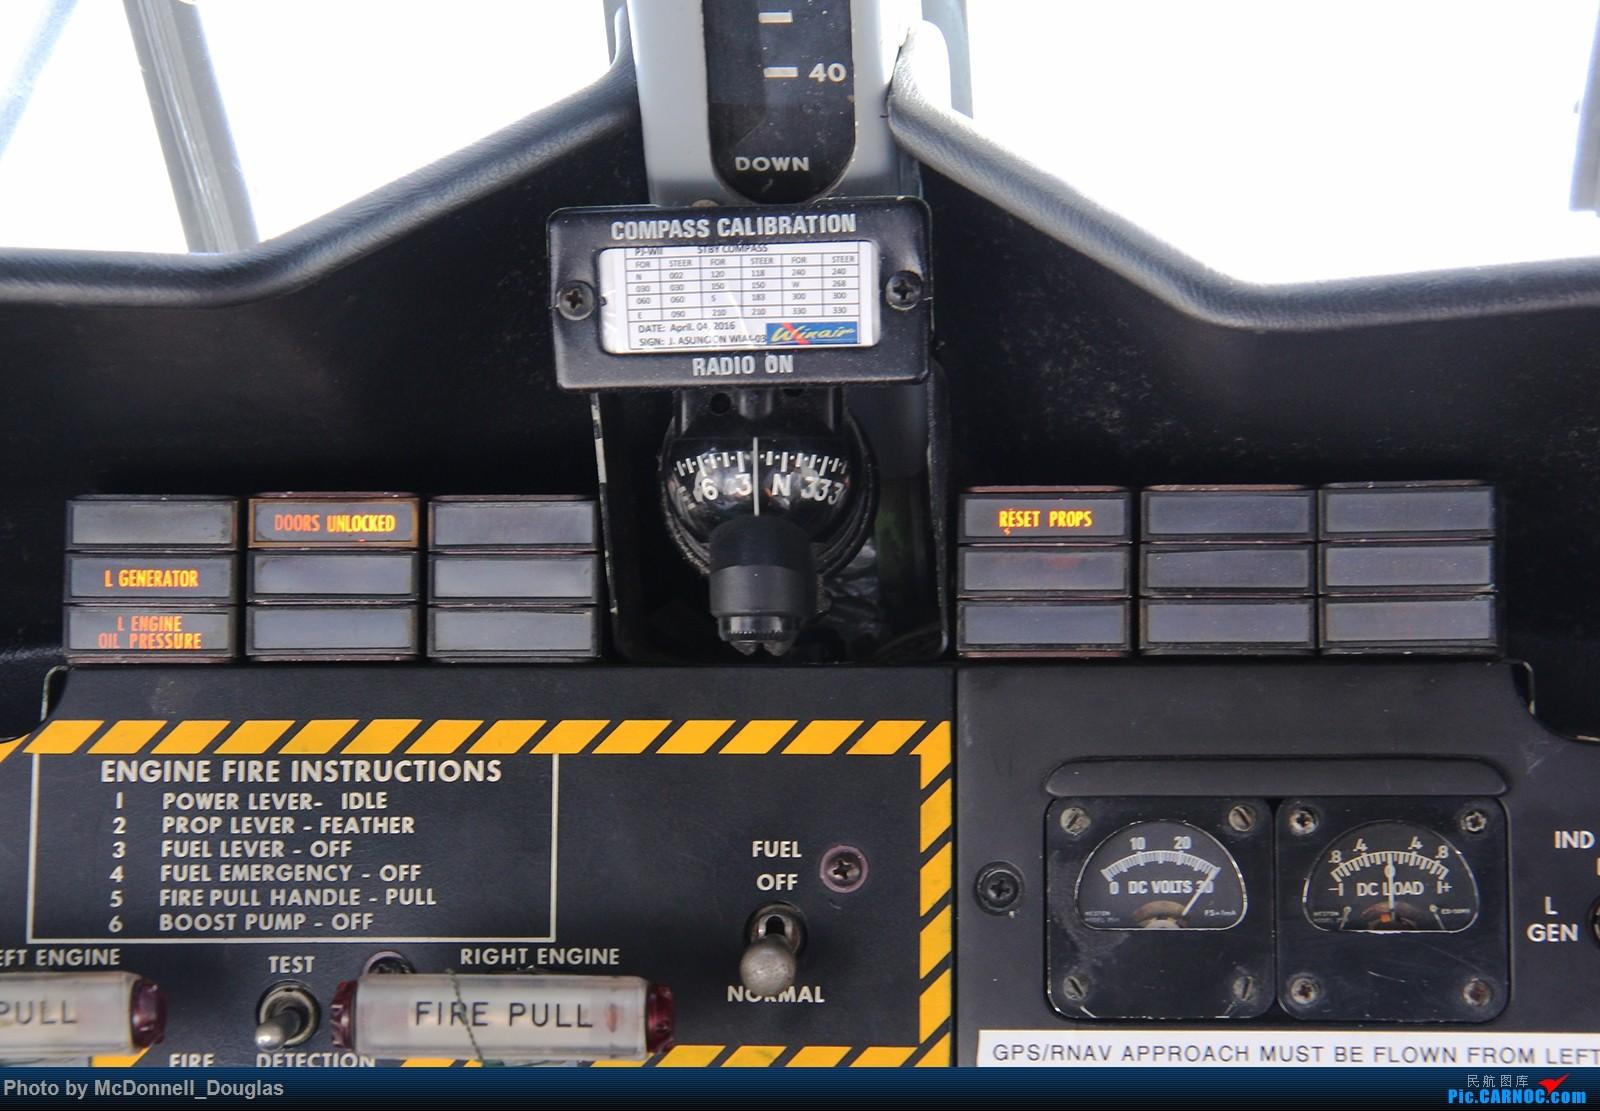 Re:[原创]【上海飞友会】图会很多,也有很多驾驶舱,杂七杂八的美帝,梦寐以求的圣马丁,这更绝不弃贴【驾驶舱已出现】【已更新至圣马丁部分】 DE HAVILLAND CANADA DHC-6-310 PJ-WII Juancho Yrausquin Airport